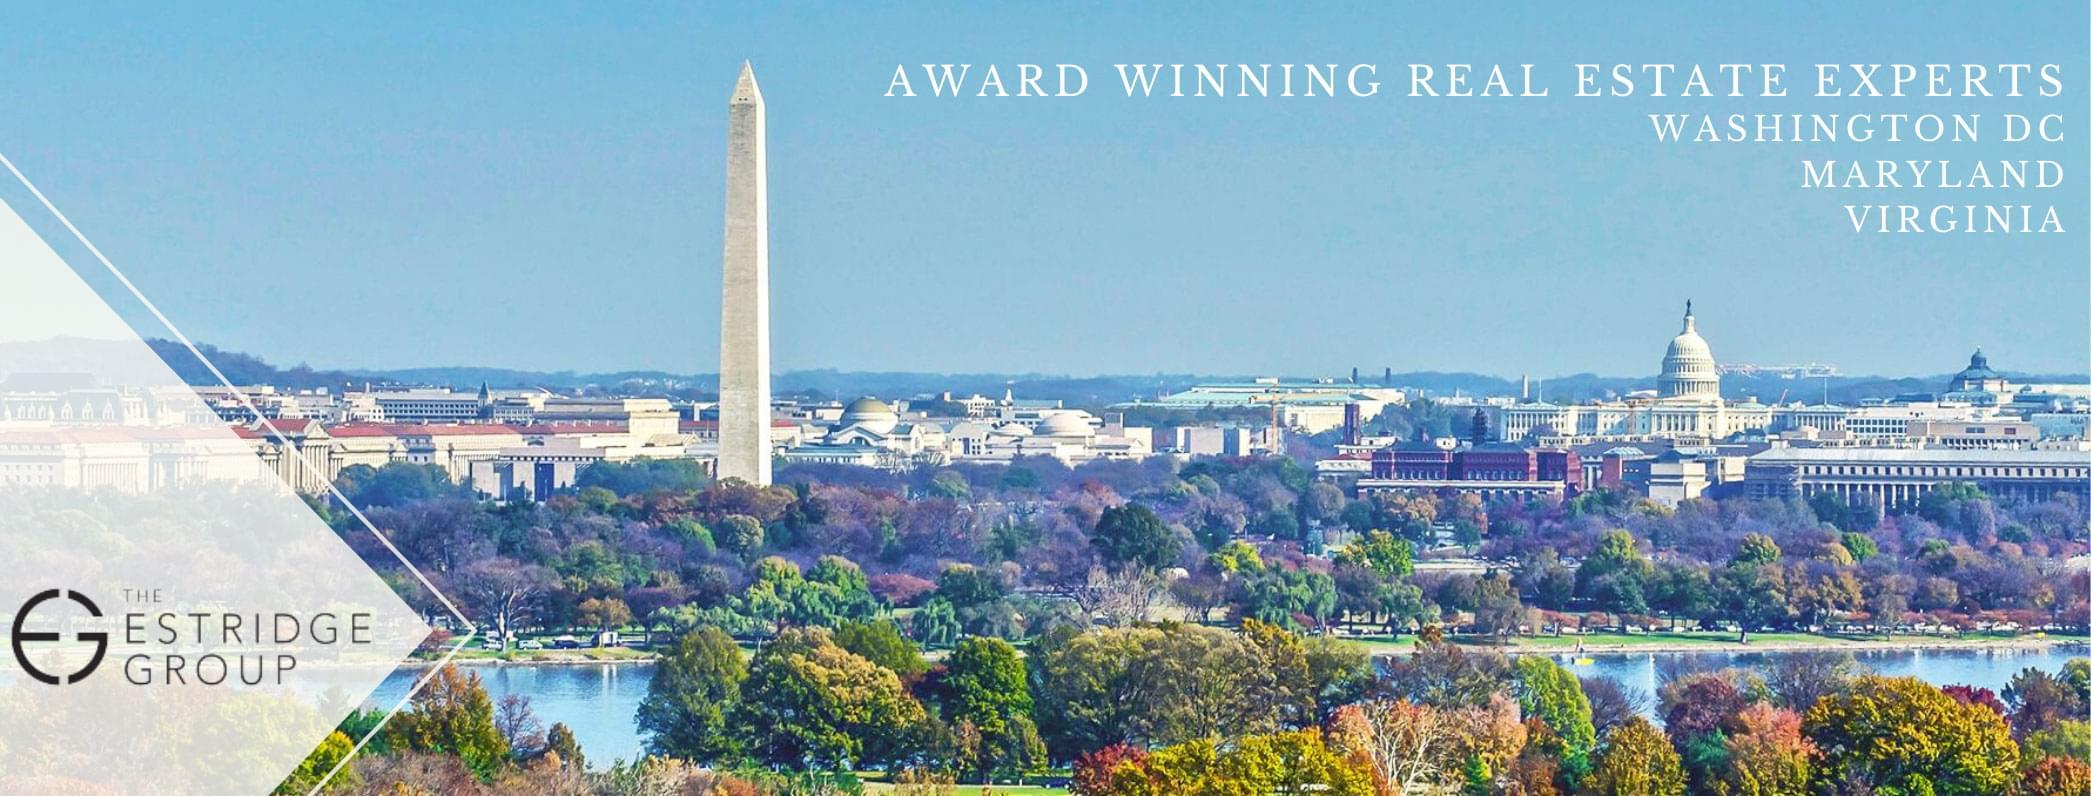 Award-winning real estate experts: Washington DC, Maryland, Virginia